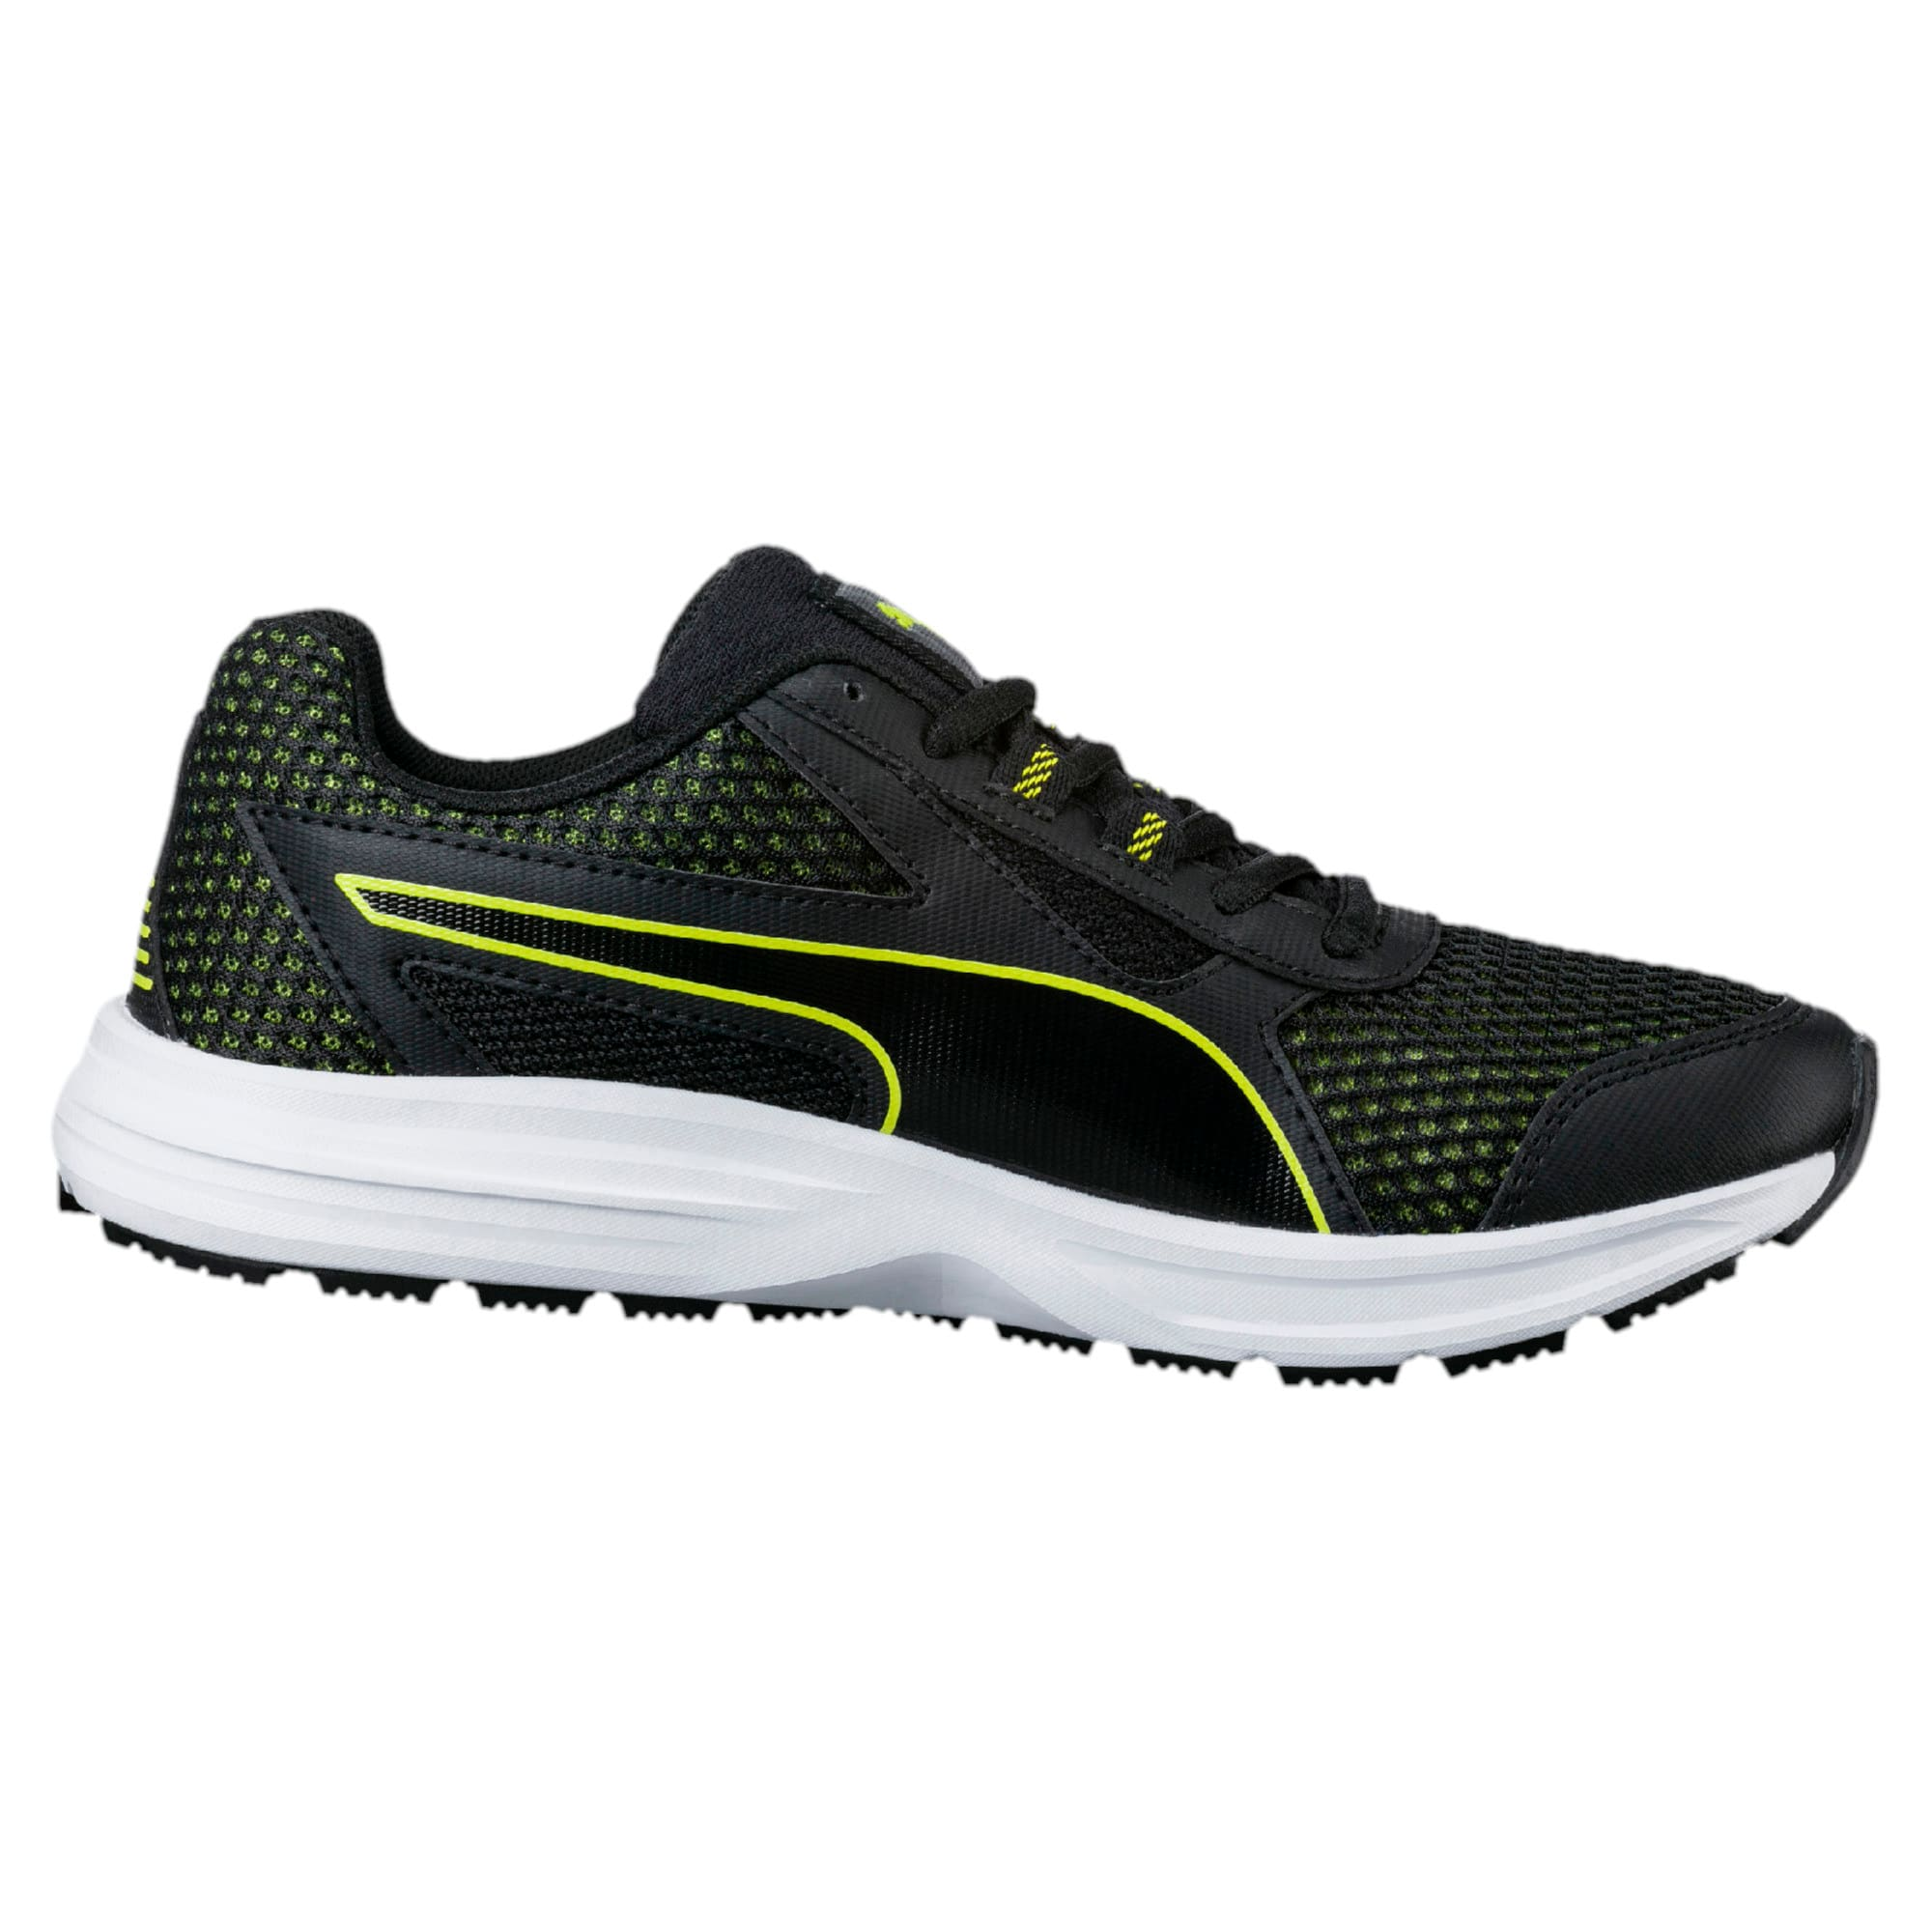 Thumbnail 5 of Essential Runner Kids' Running Shoes, Puma Black-Nrgy Yellow, medium-IND